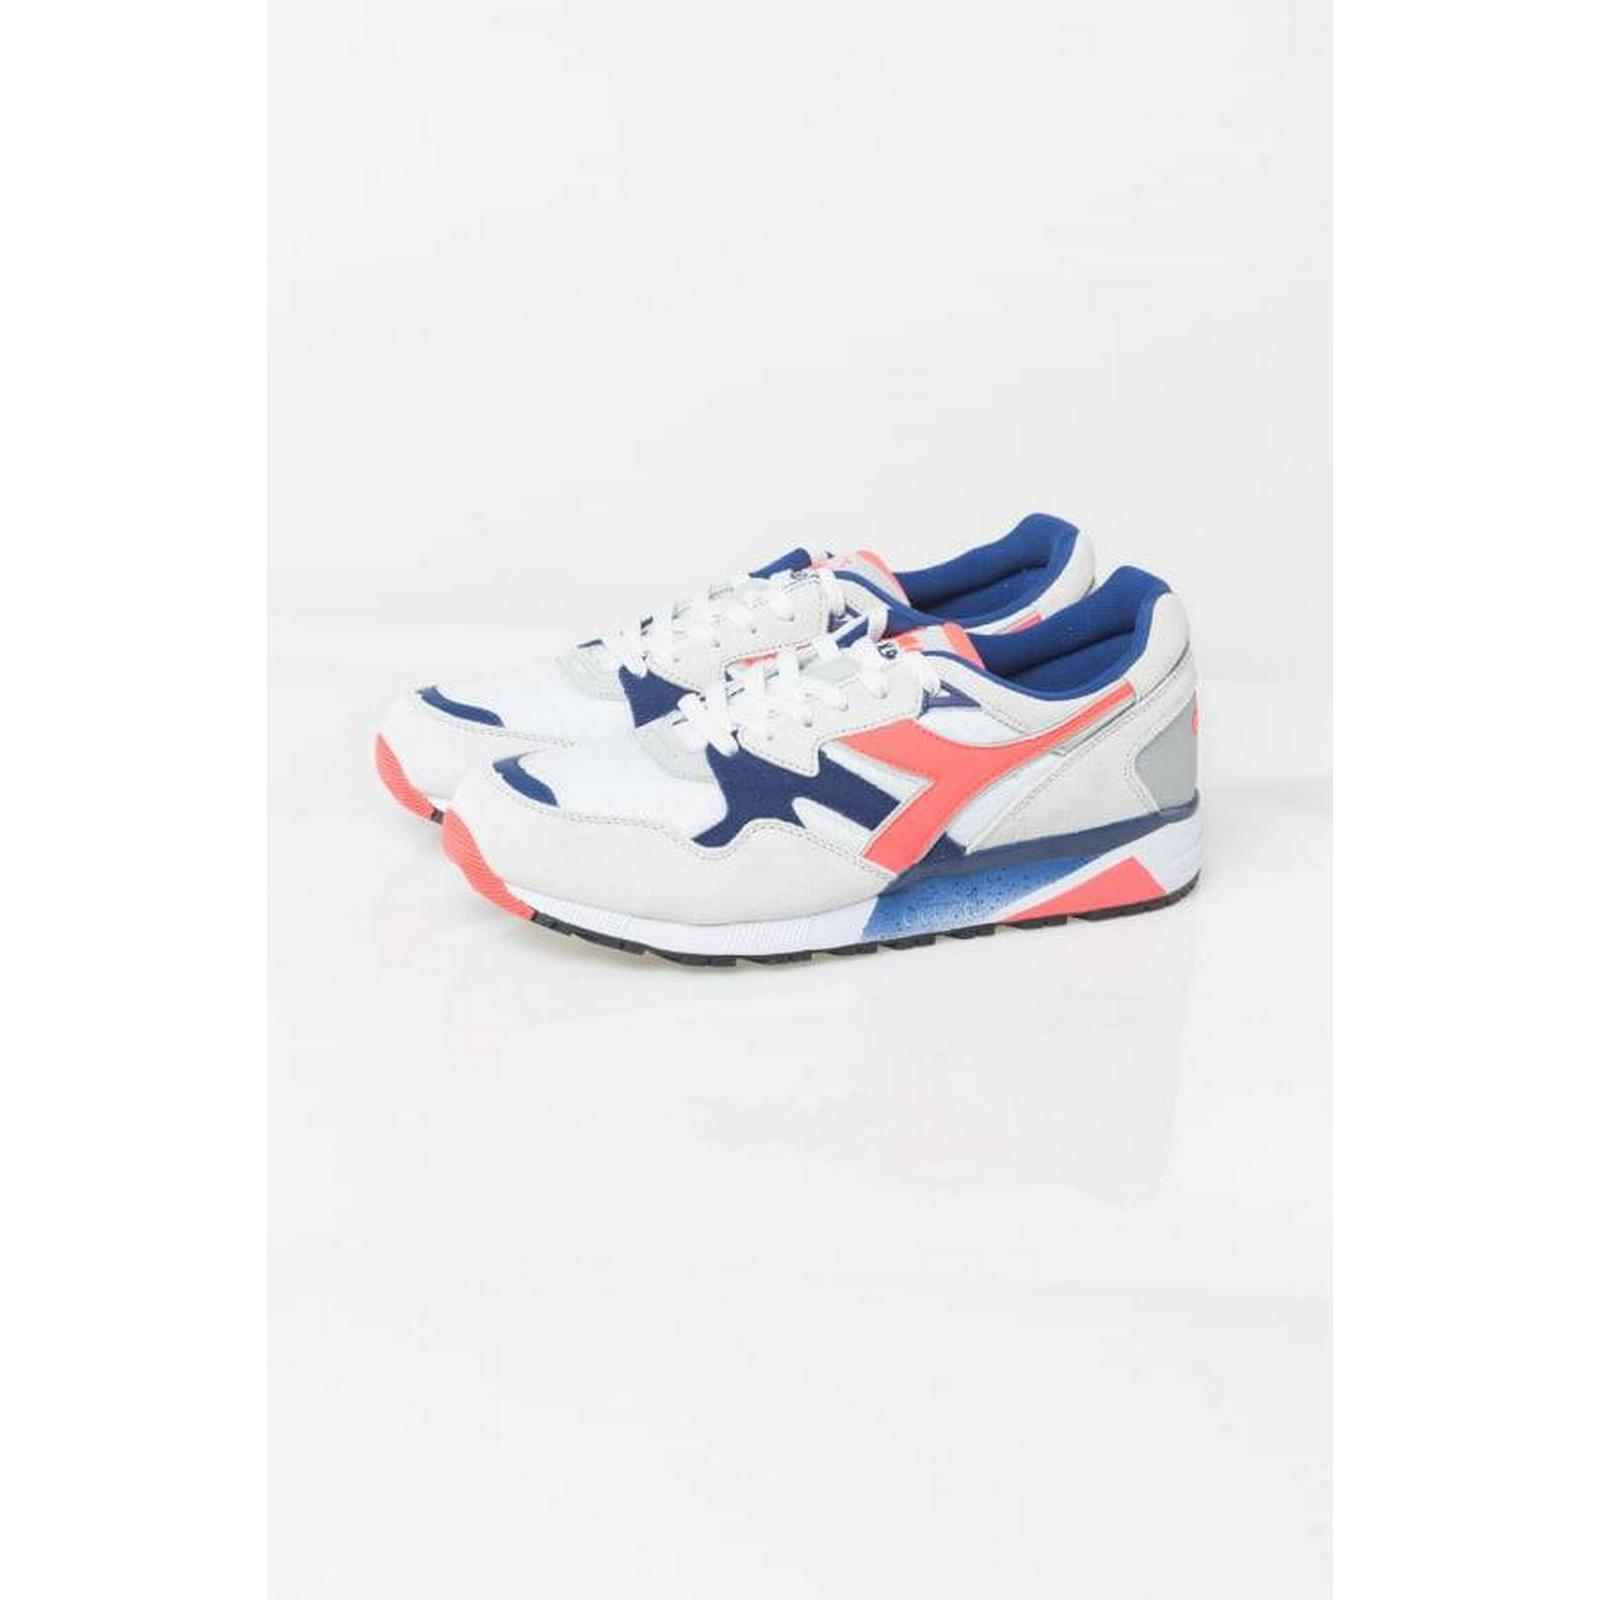 Diadora N9002 Trainers - Size: White UK Shoe Size: - 8 fa23a5